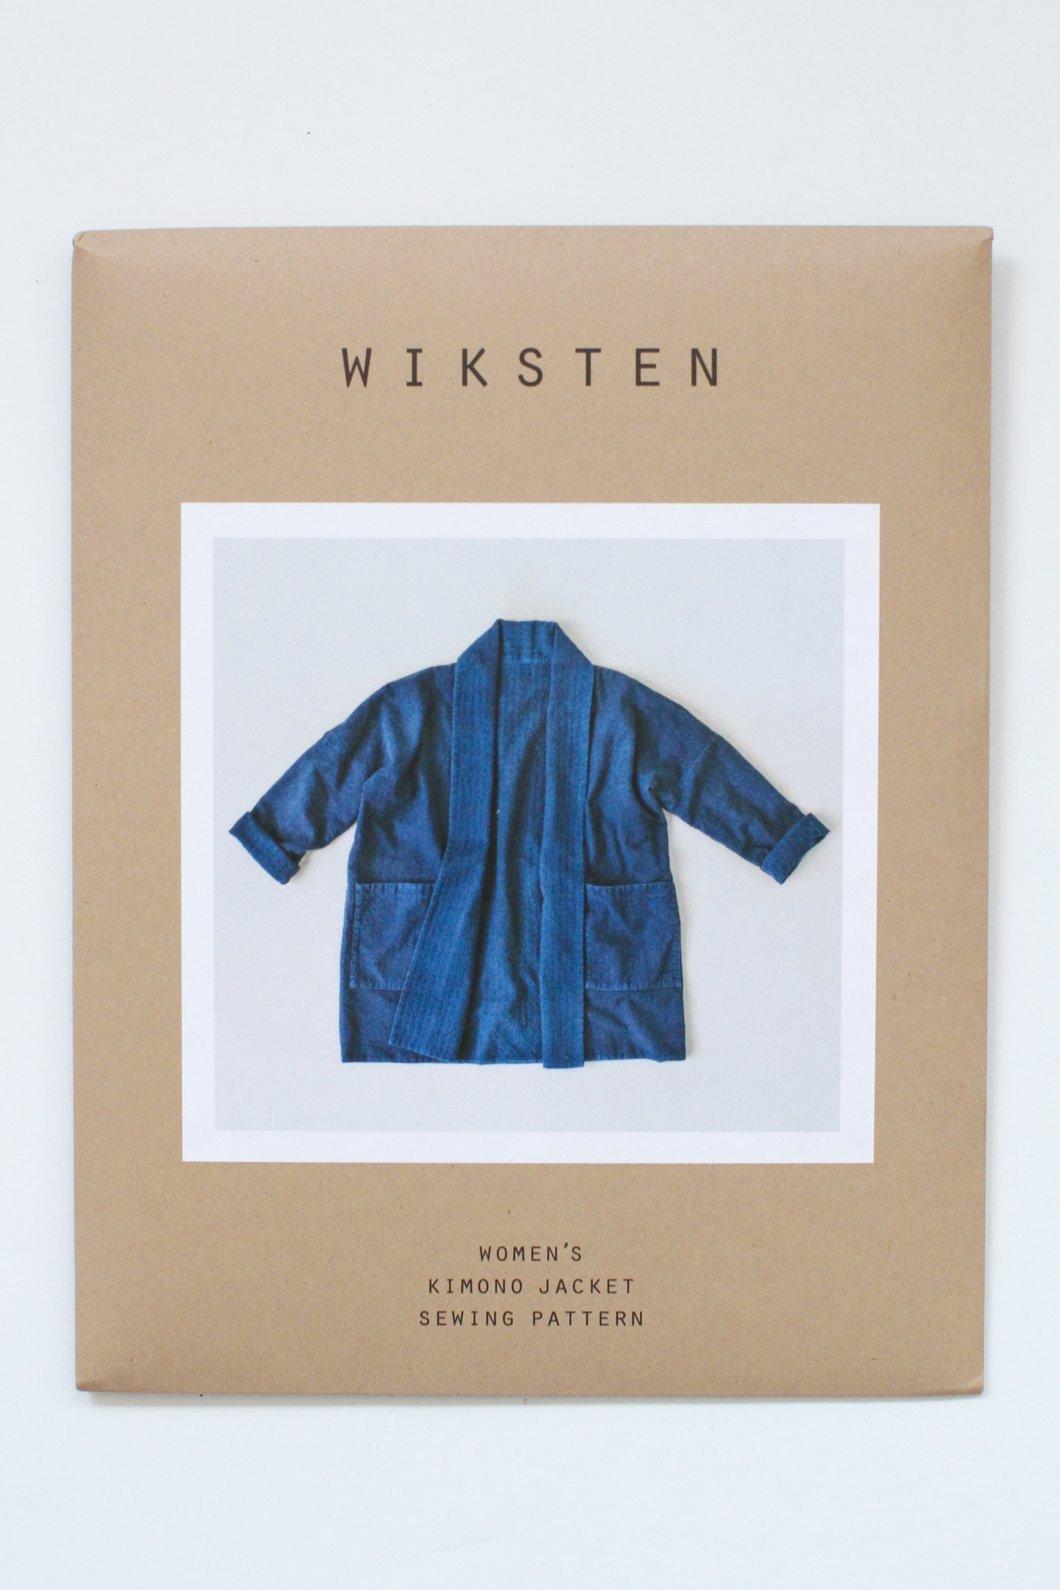 Wiksten - Women�s Kimono Jacket